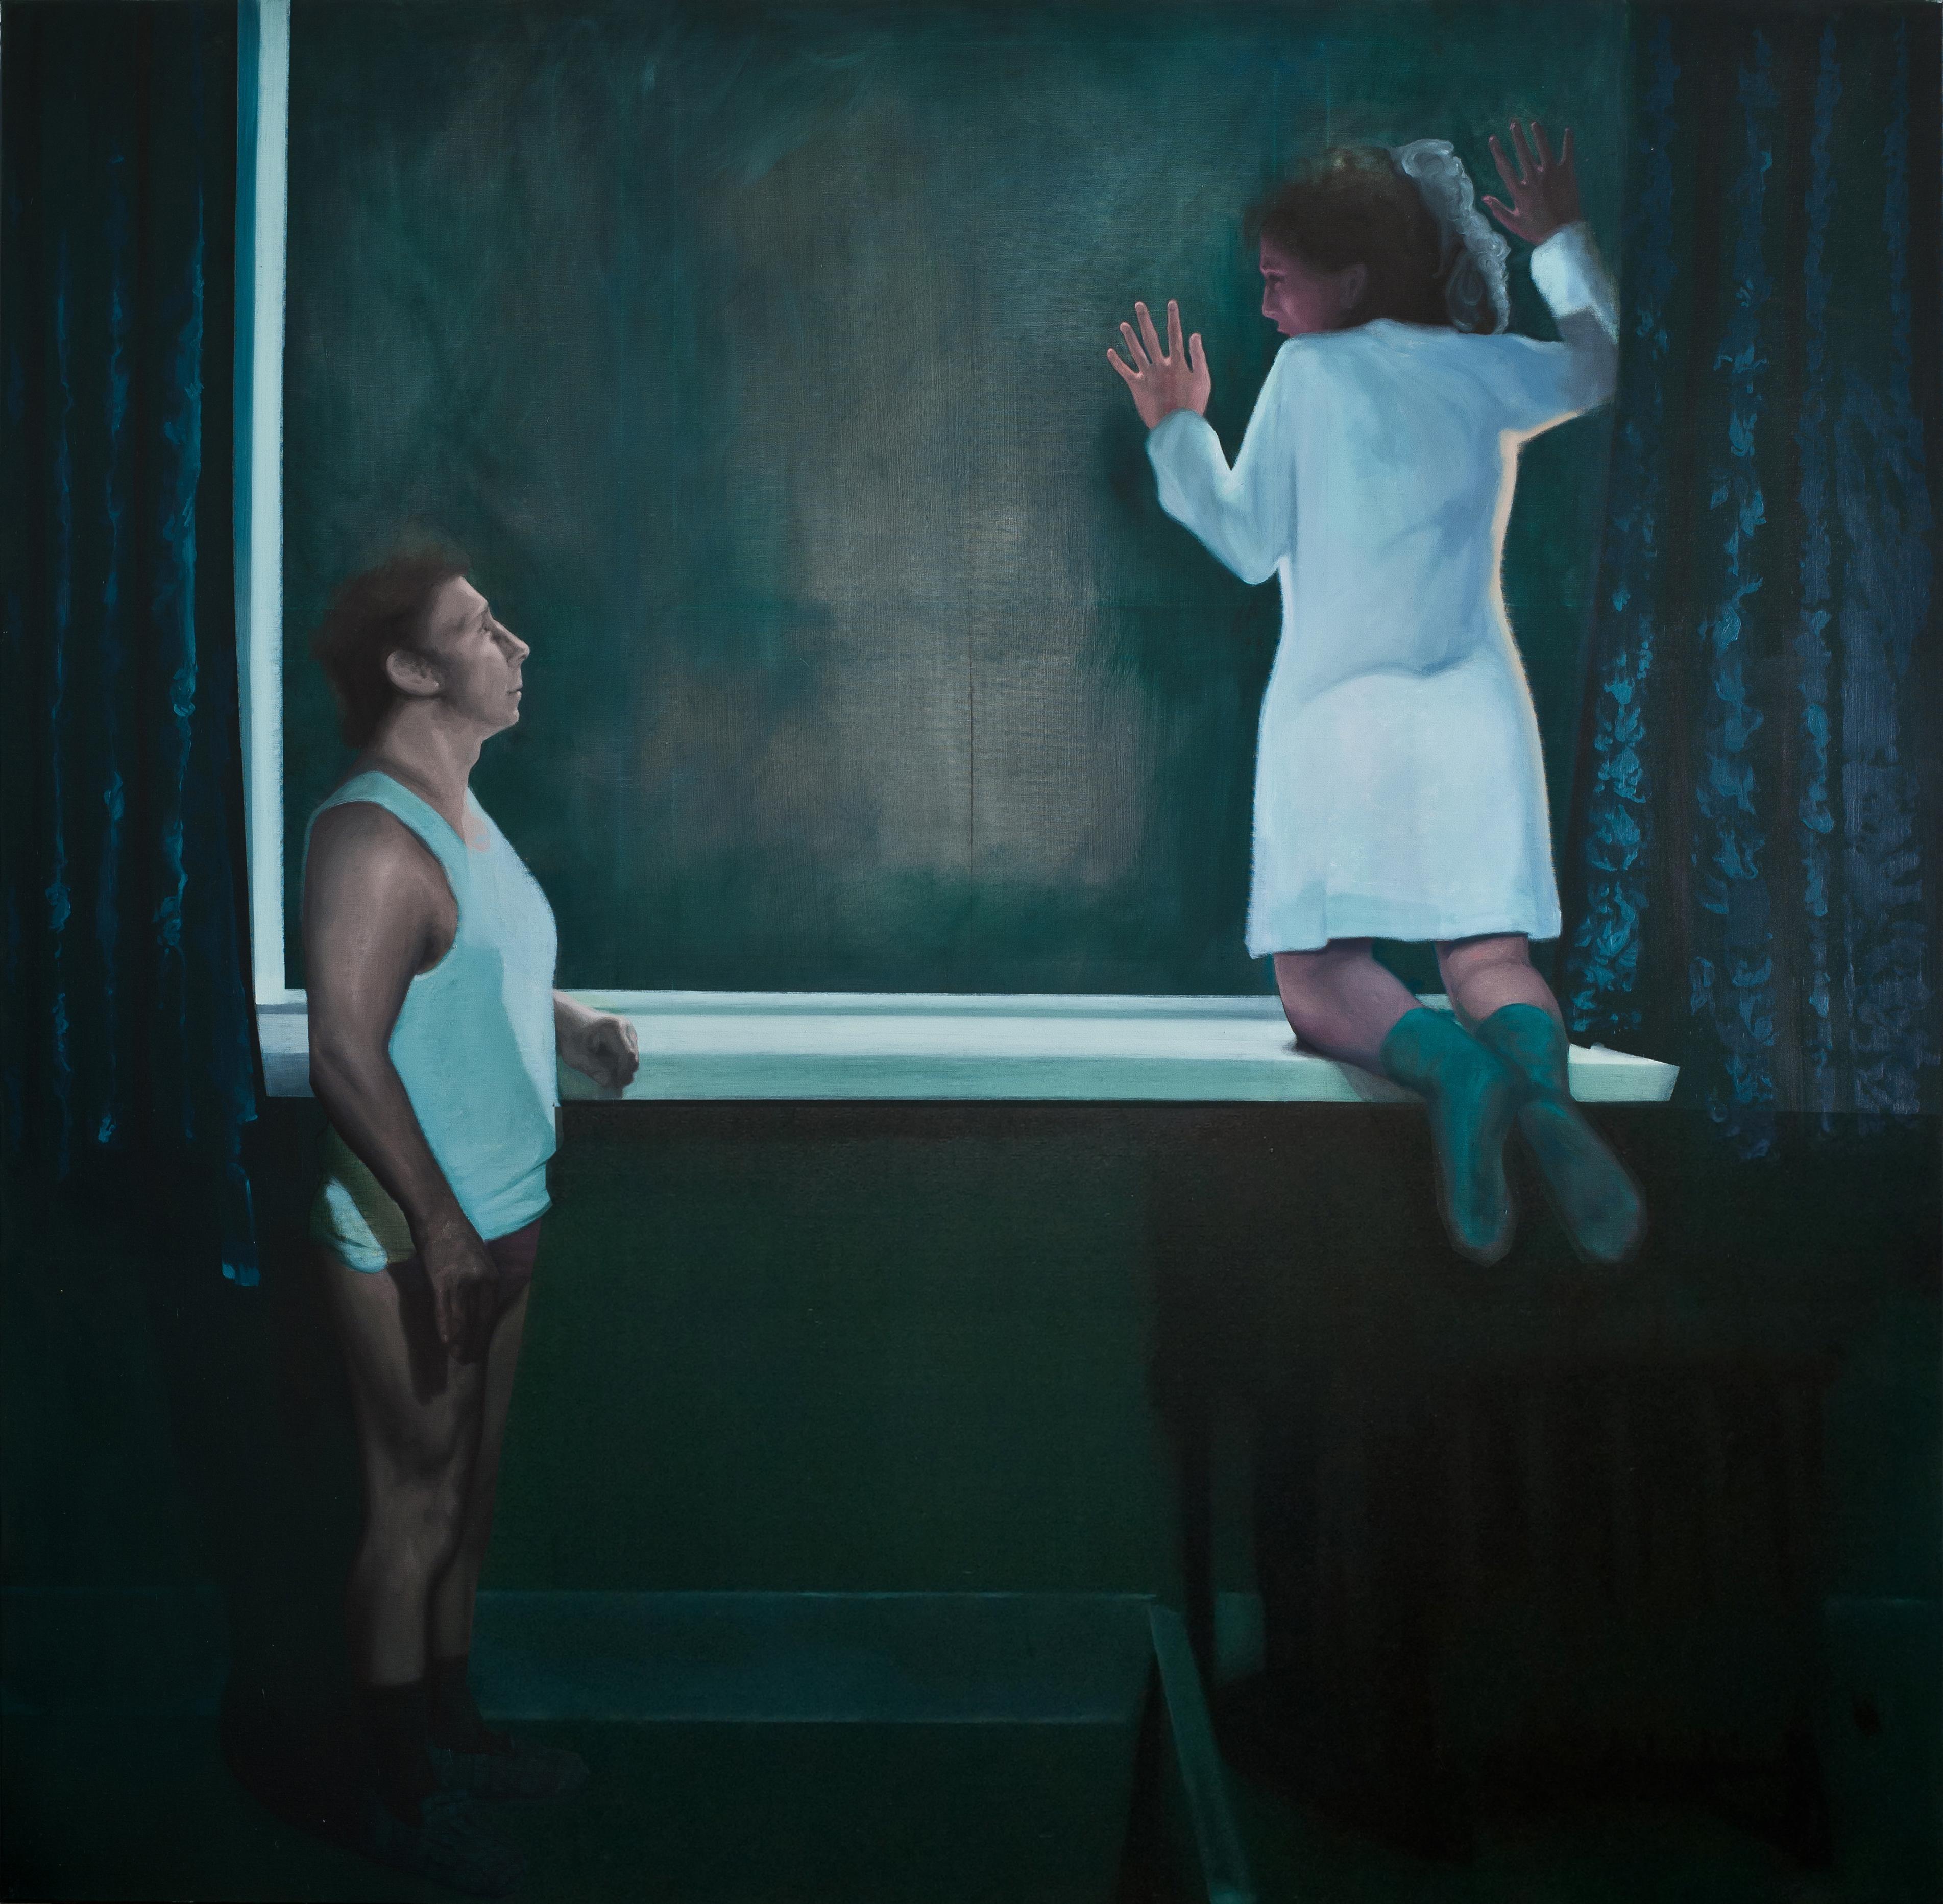 Distrust - Contemporary, Figurative Painting, Window, Blue, Human, Female, Male